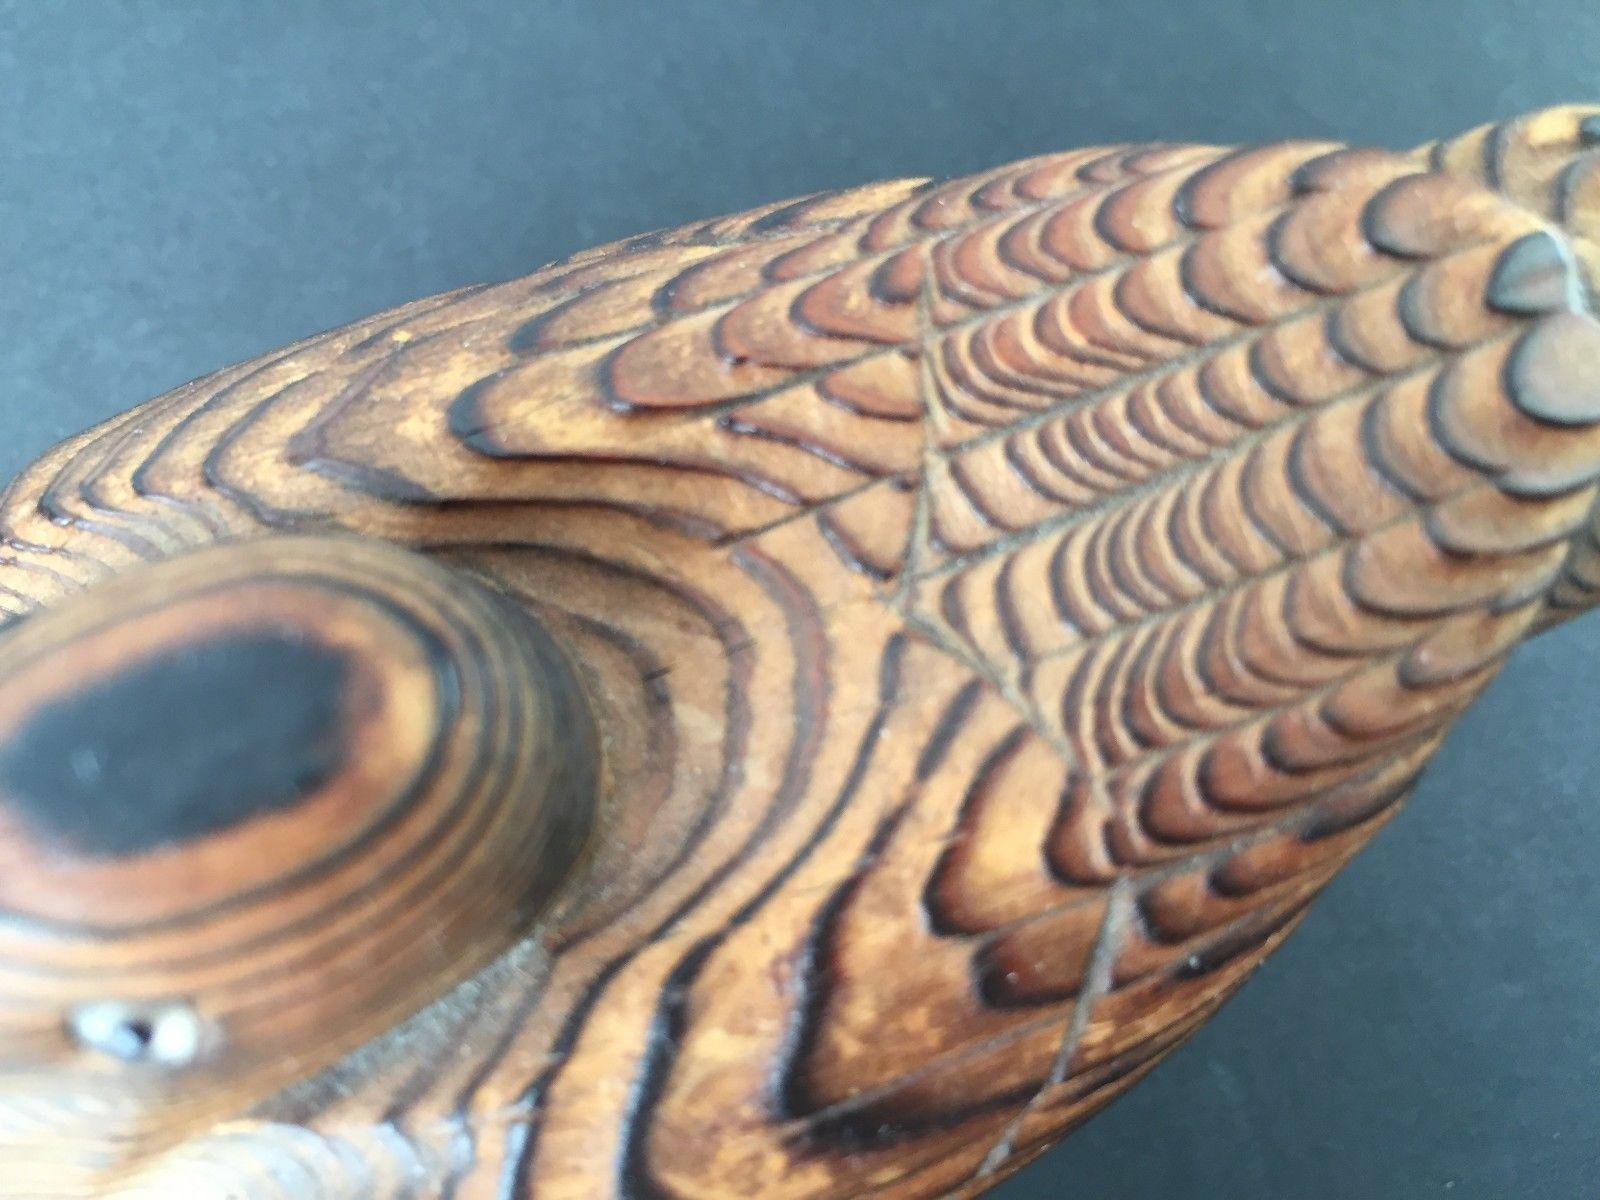 Vintage Mid Century Modern Wony Woco Japan Carved Cryptomeria Wood Bird or Duck